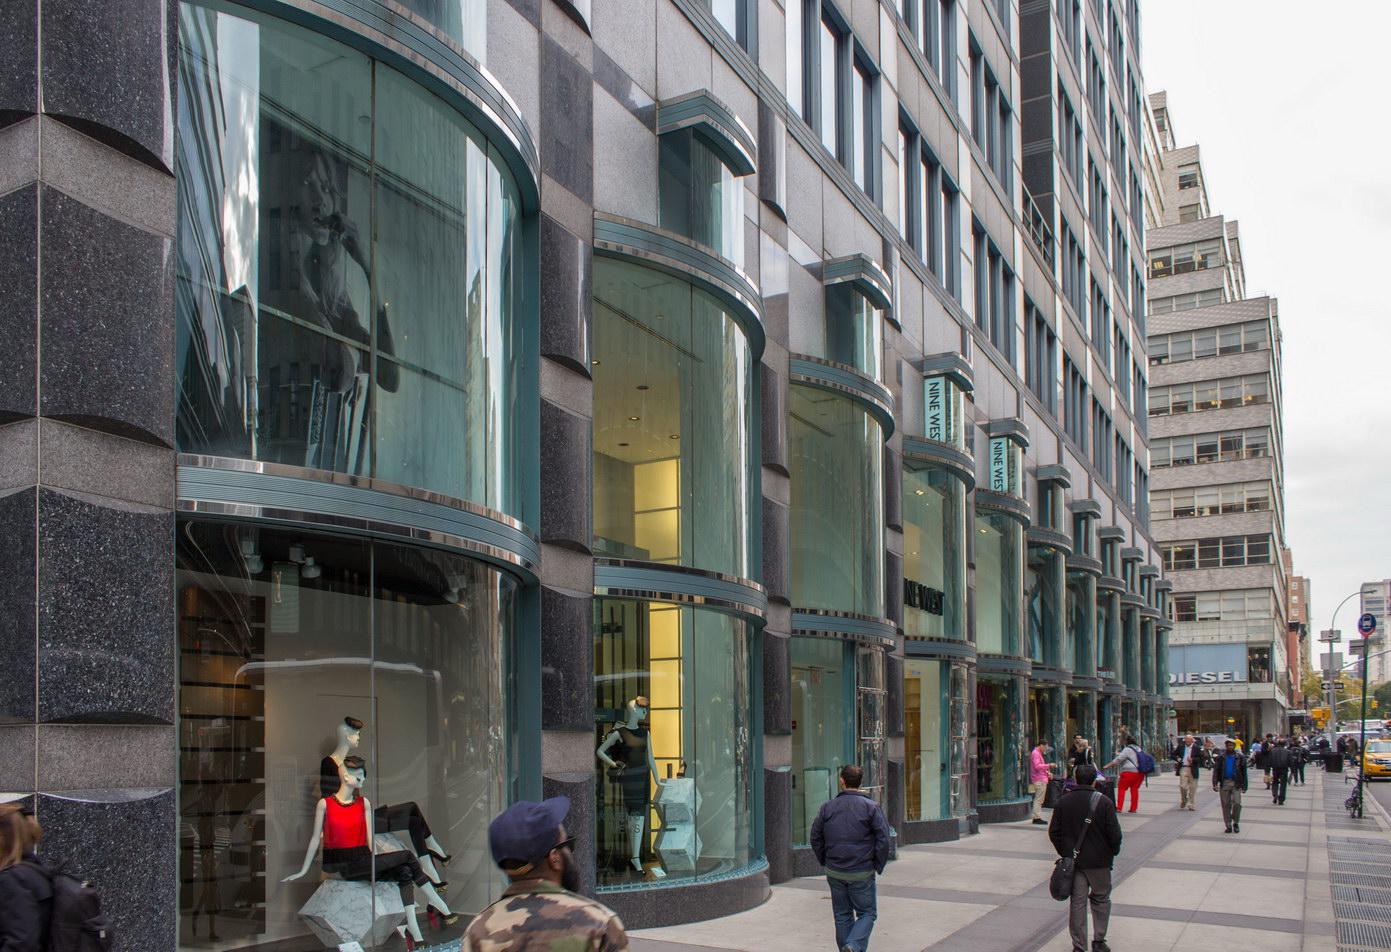 Bowed double-height storefronts face Lexington Avenue.